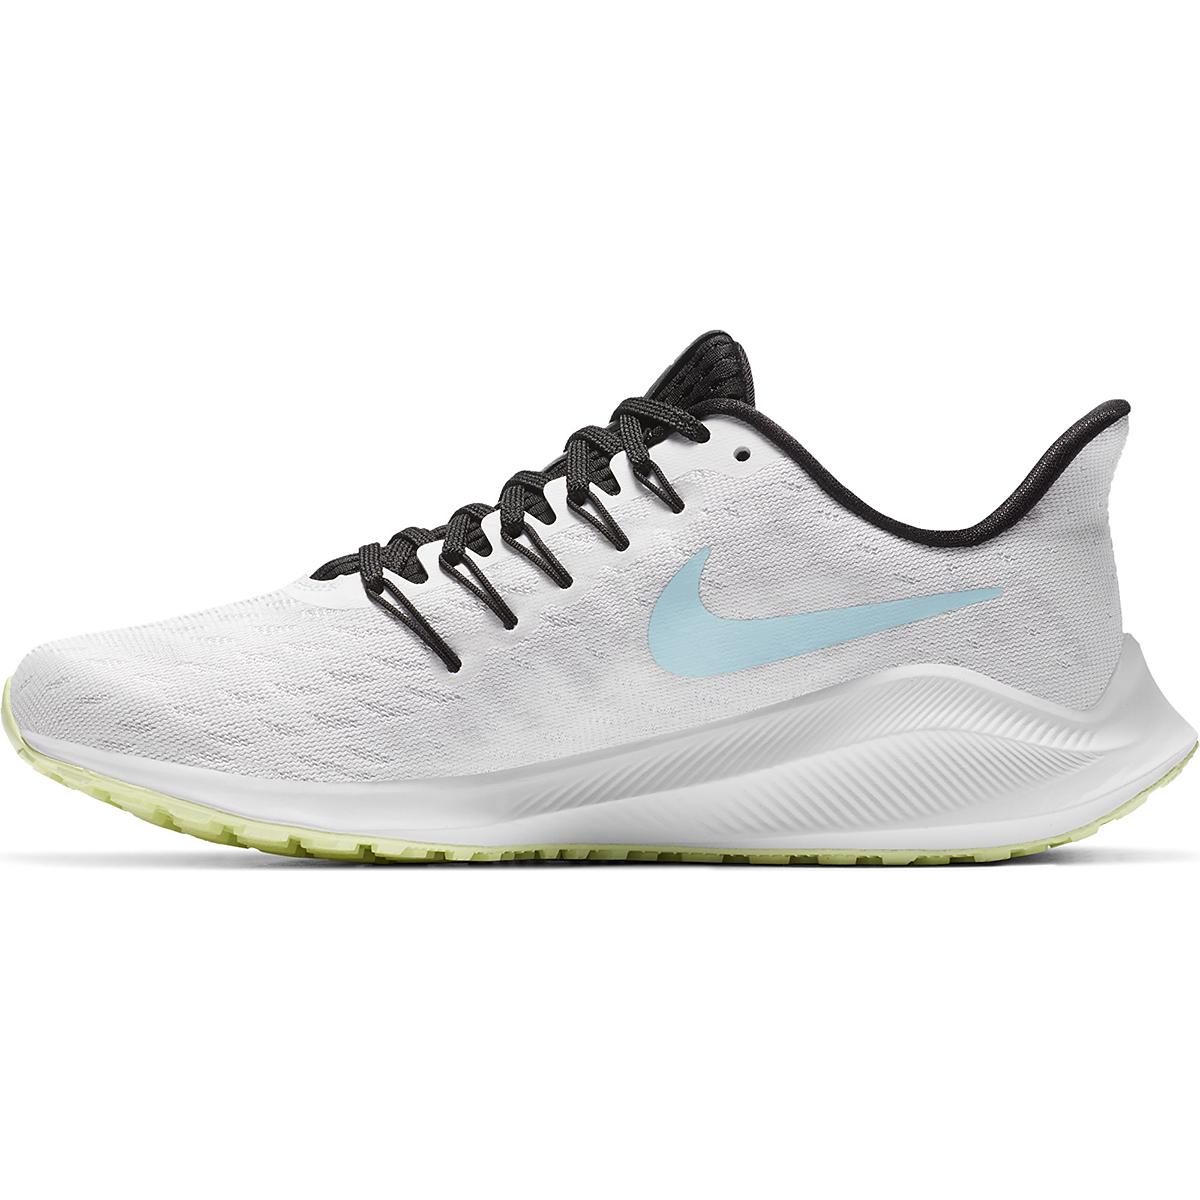 Women's Nike Vomero 14 Running Shoe - Color: White/Glacier Ice-Black-Pure Platinum - Size: 5 - Width: Regular, White/Glacier Ice-Black-Pure Platinum, large, image 2